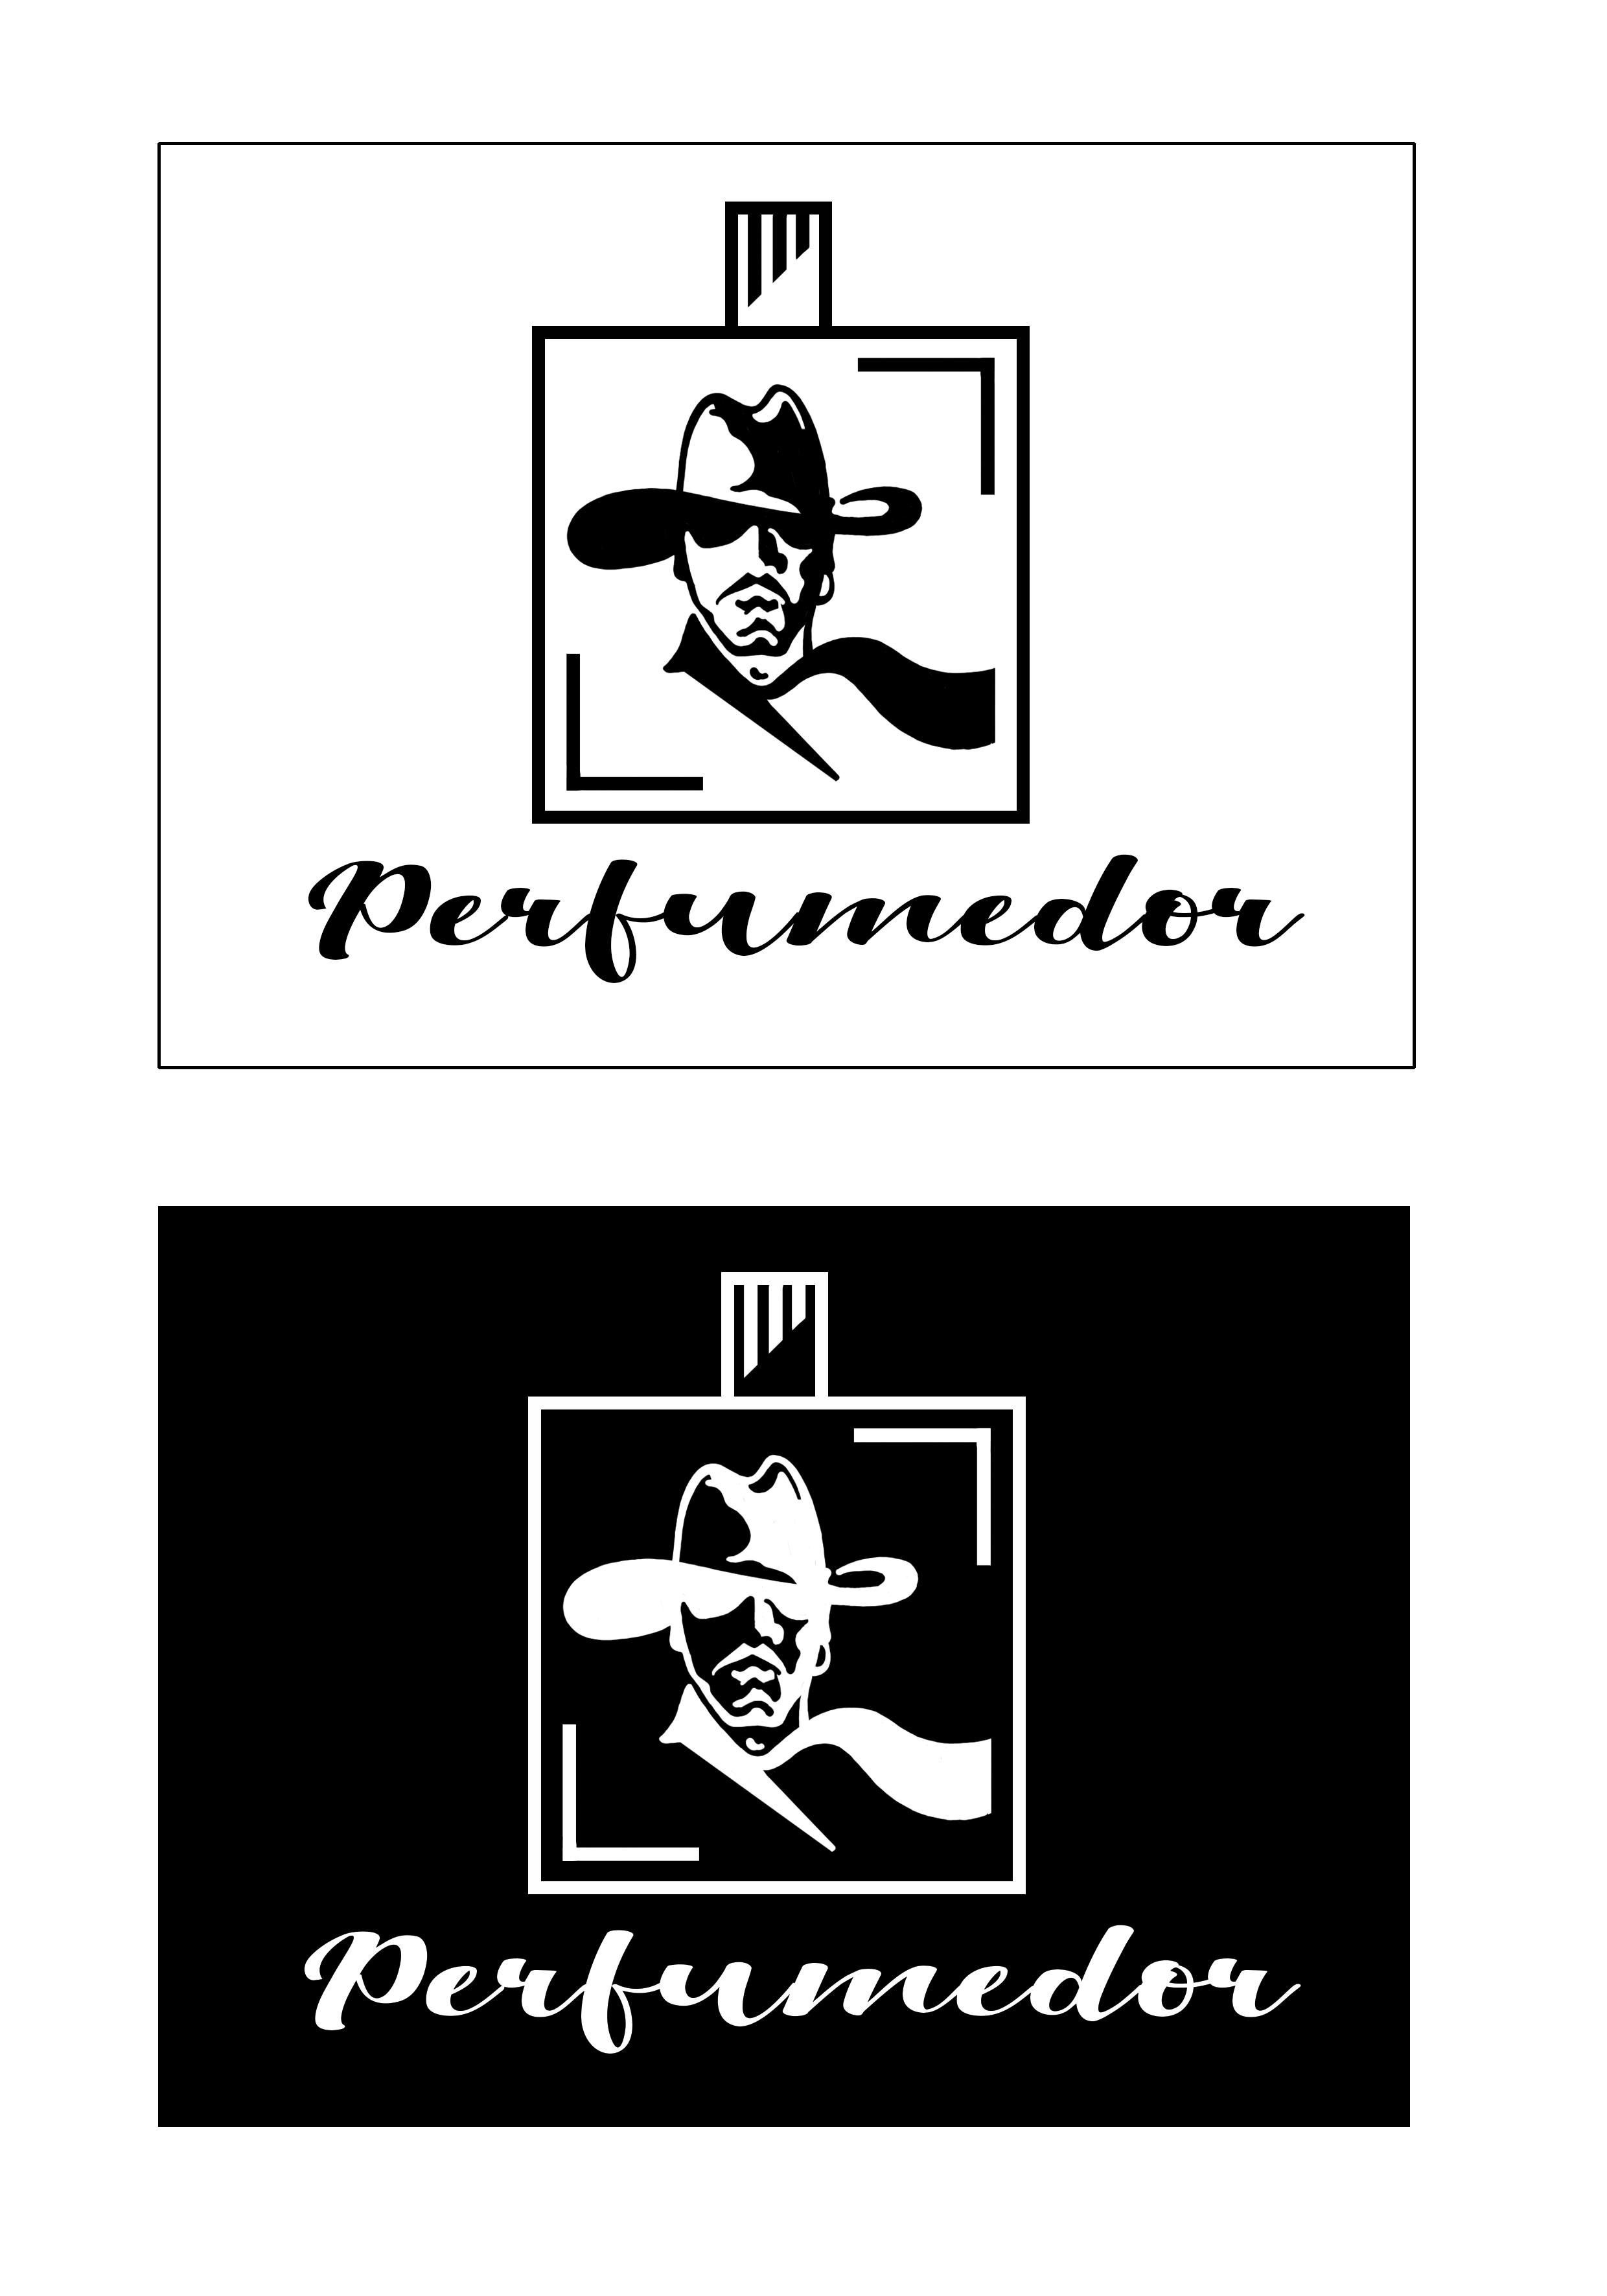 Логотип для интернет-магазина парфюмерии фото f_8105b48dcedb42b9.jpg